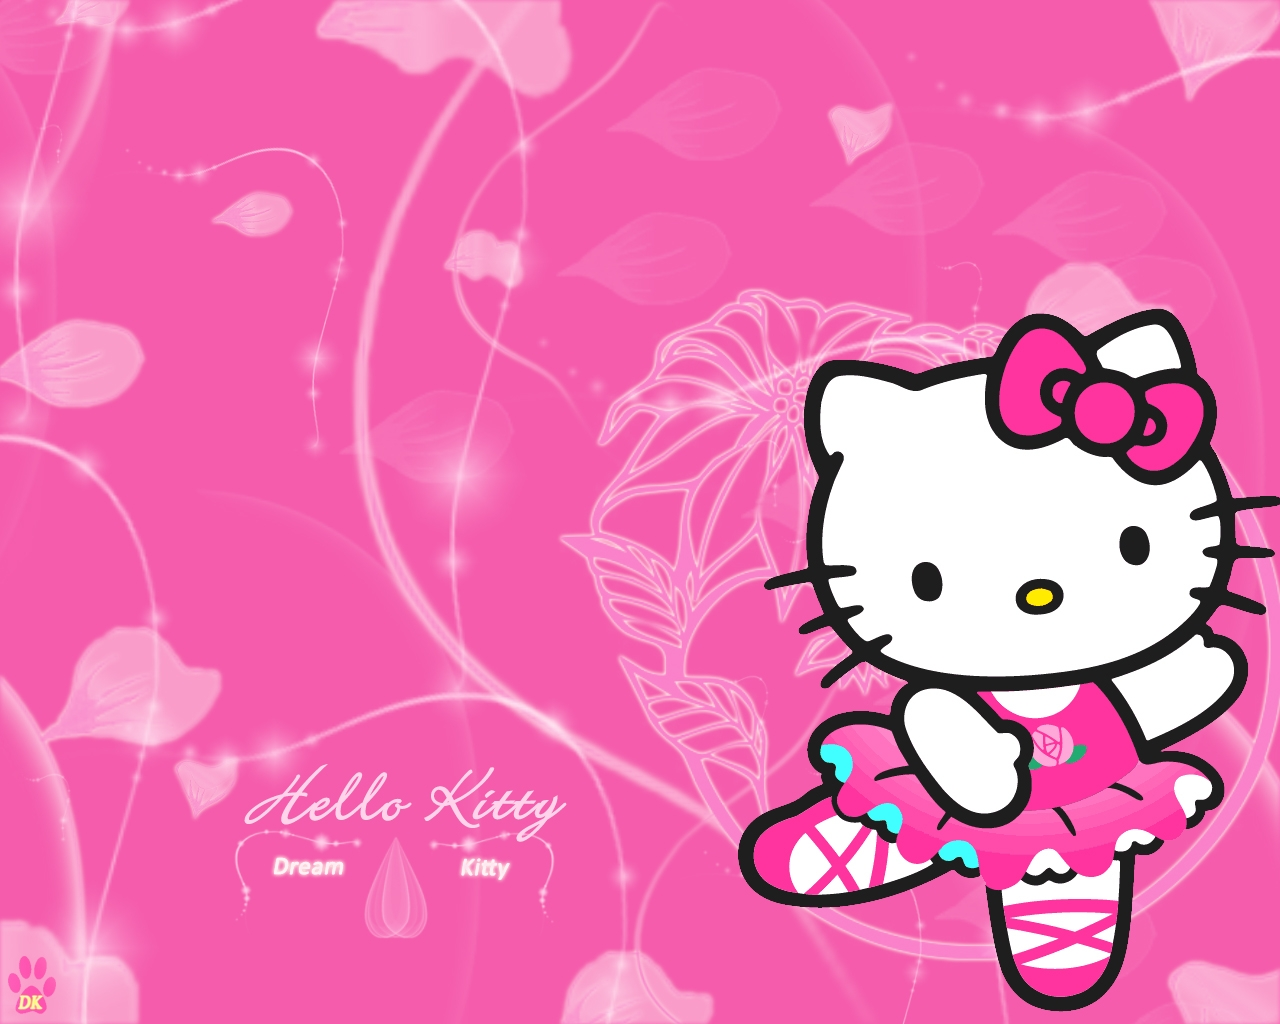 Hello Kitty Wallpaper 1280x1024 Hello Kitty Dream Kitty 1280x1024